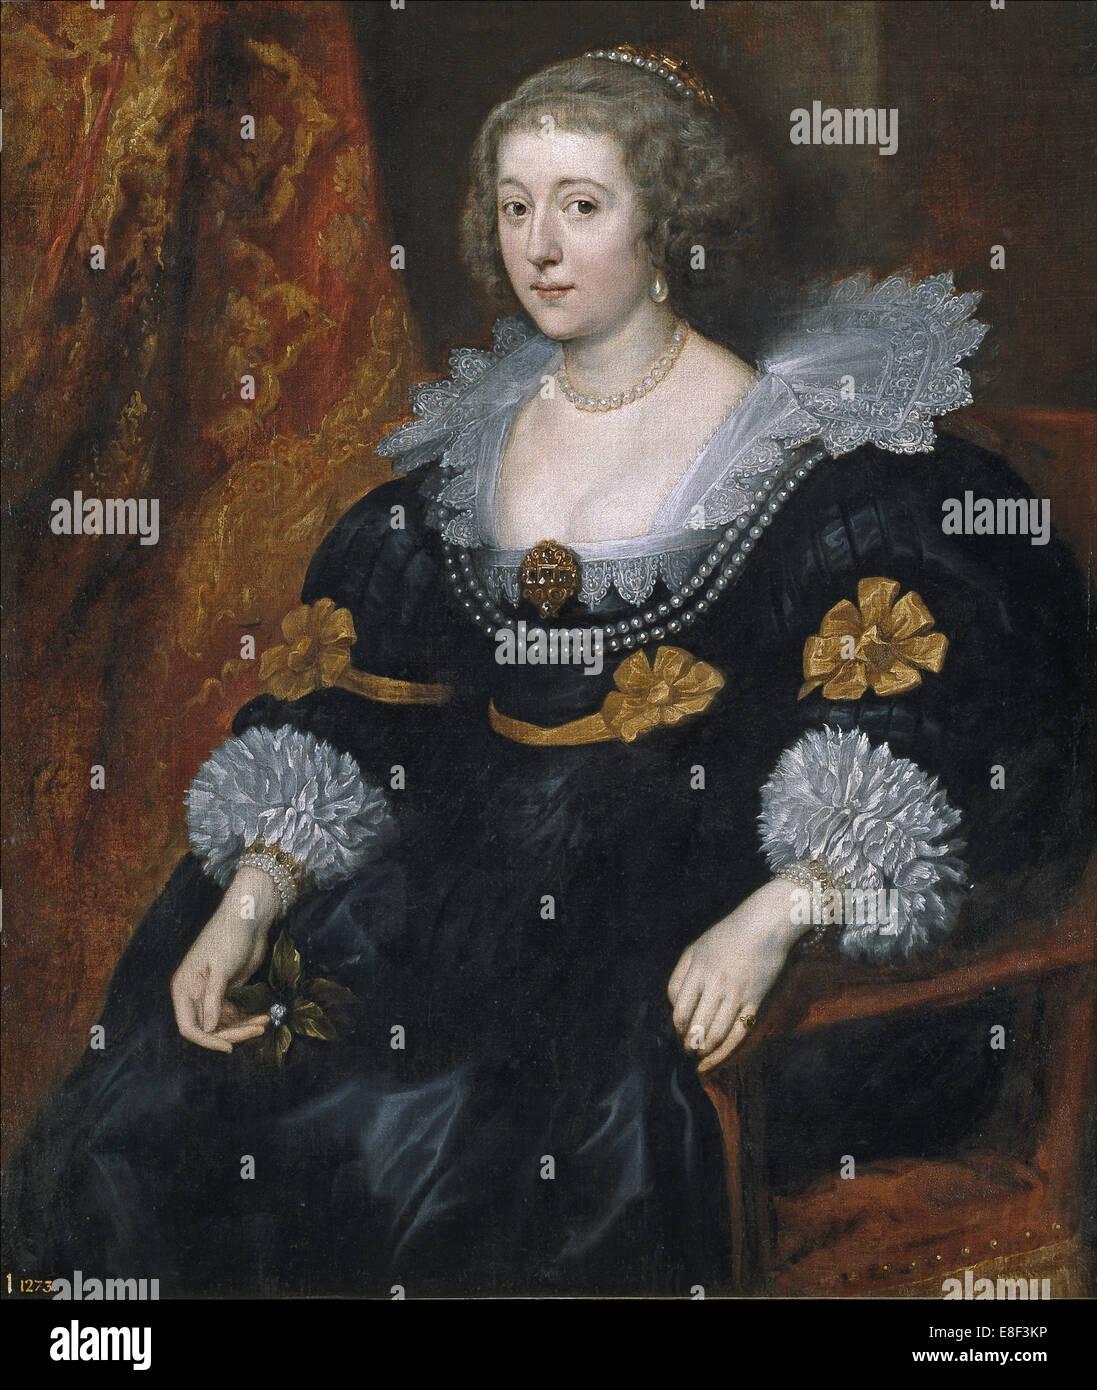 Portrait of Amalia of Solms-Braunfels (1602-1675). Artist: Dyck, Sir Anthony van (1599-1641) - Stock Image